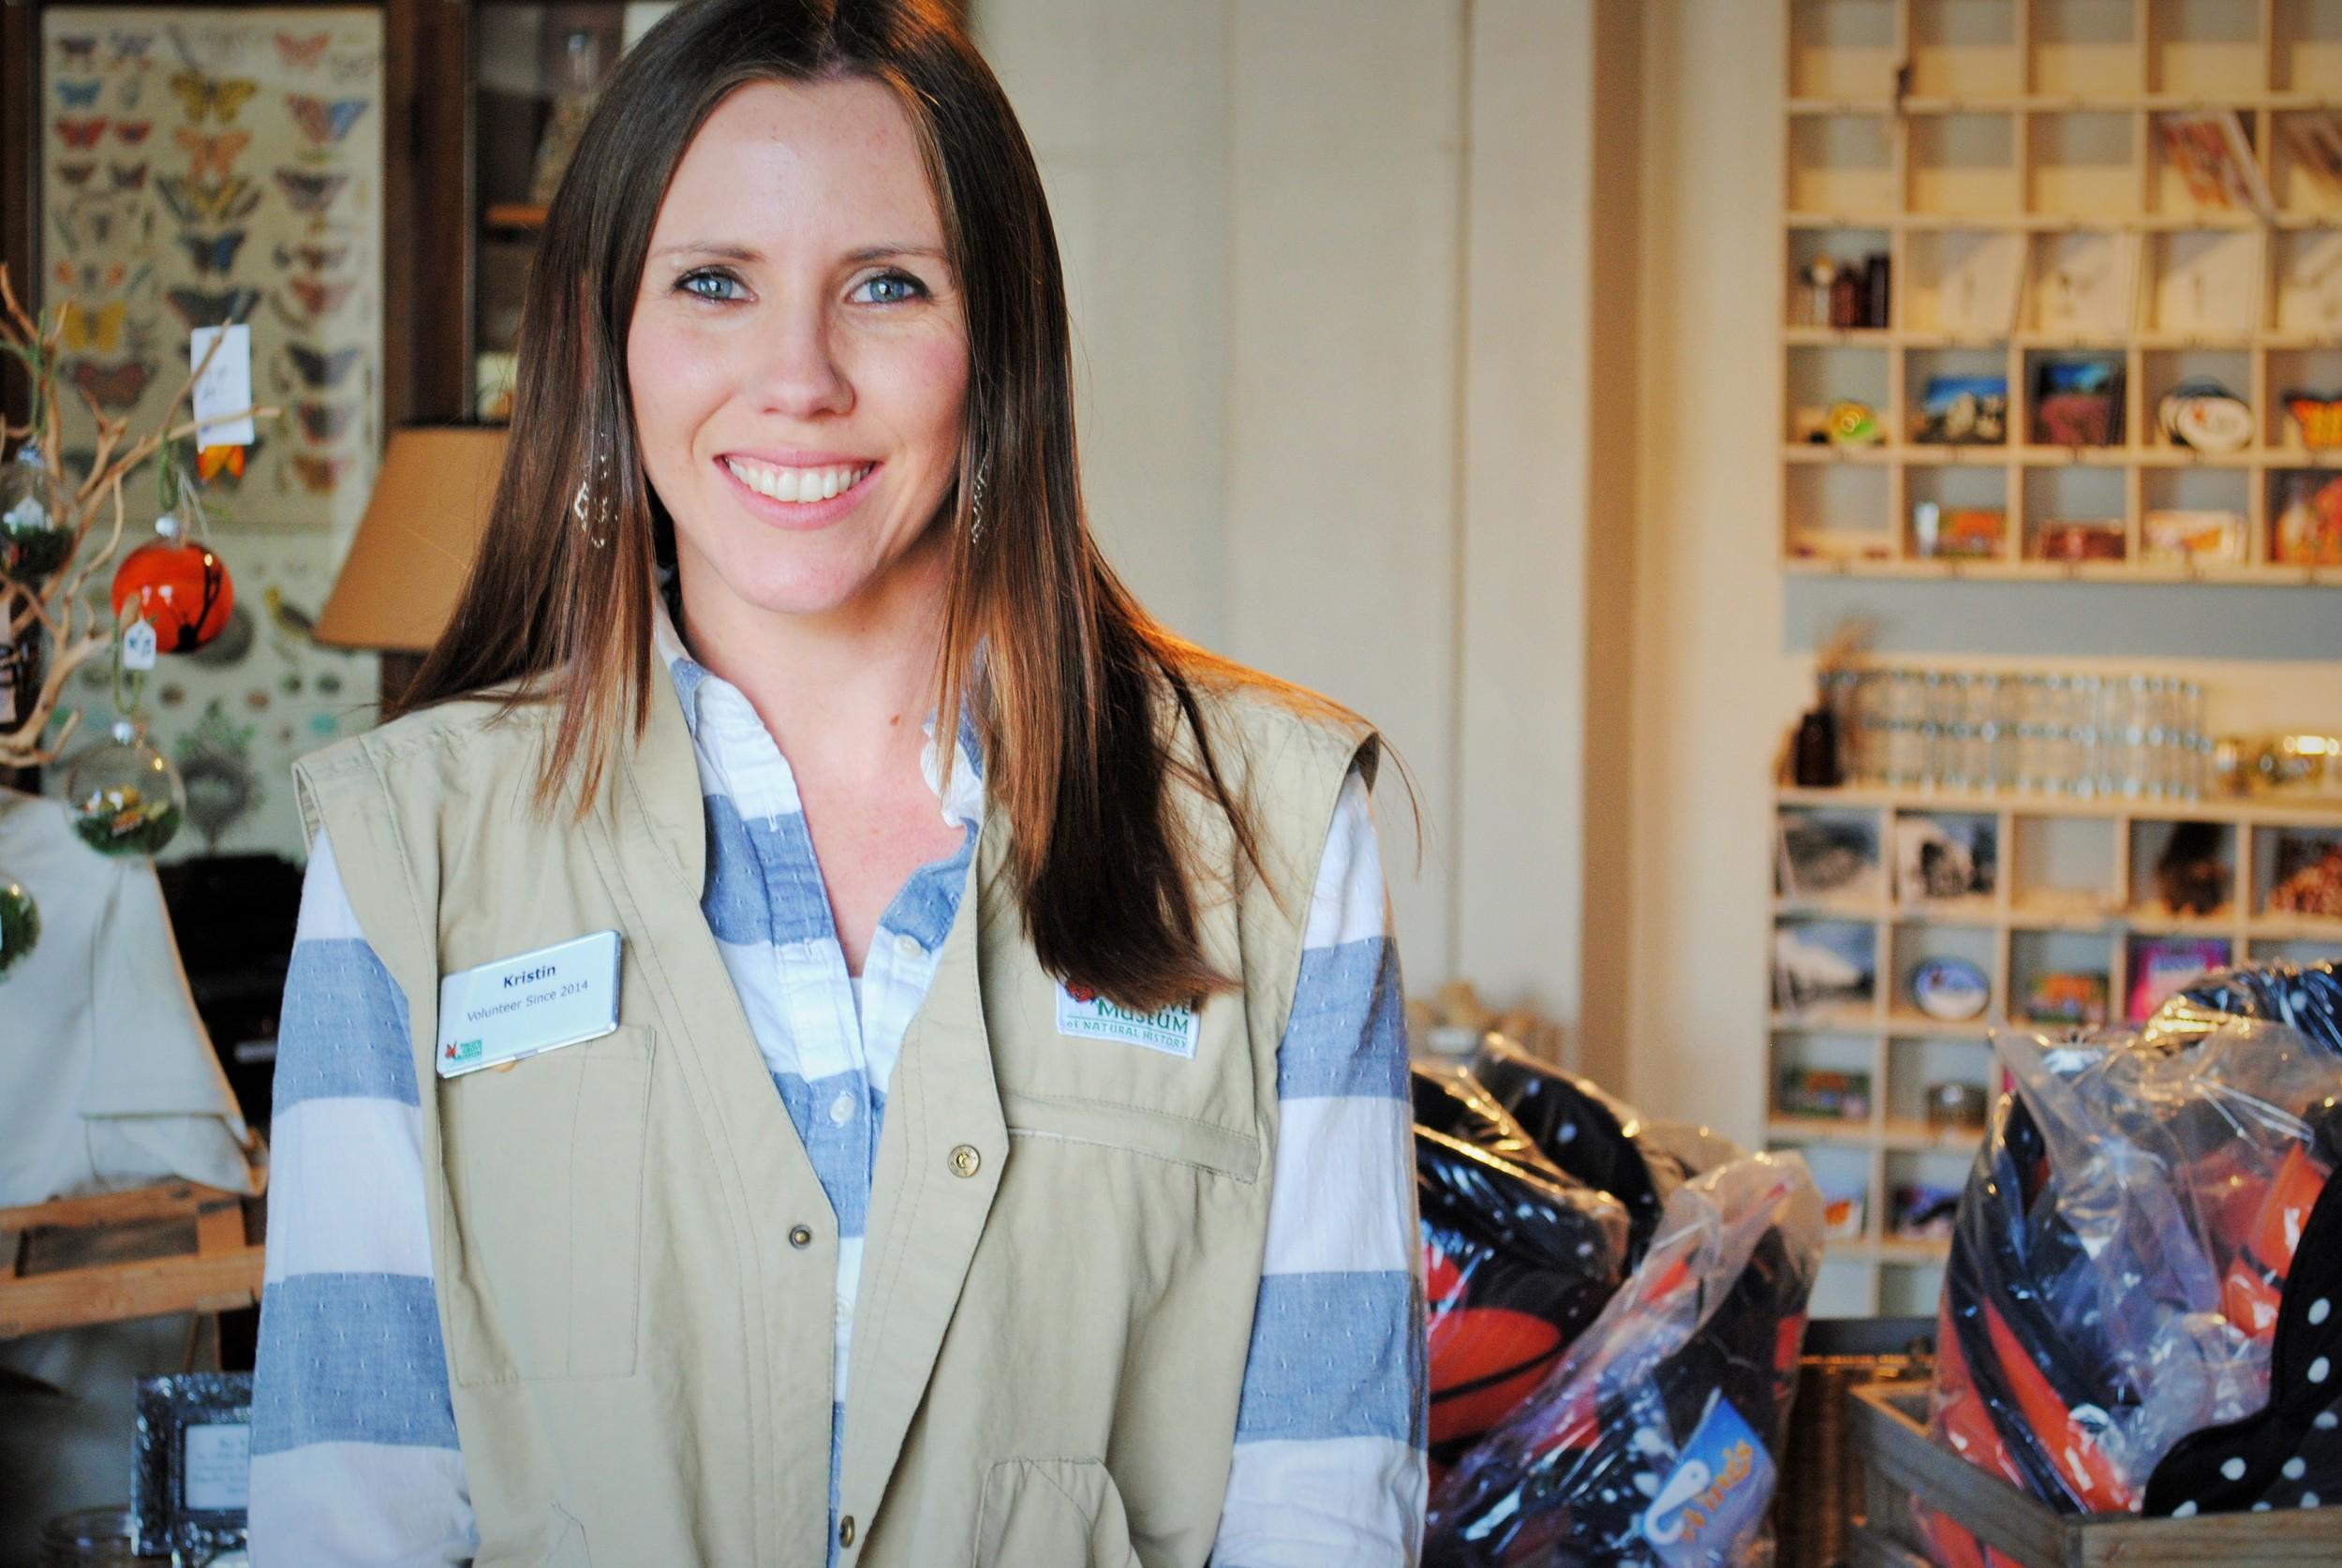 Volunteer Kristin Stephens